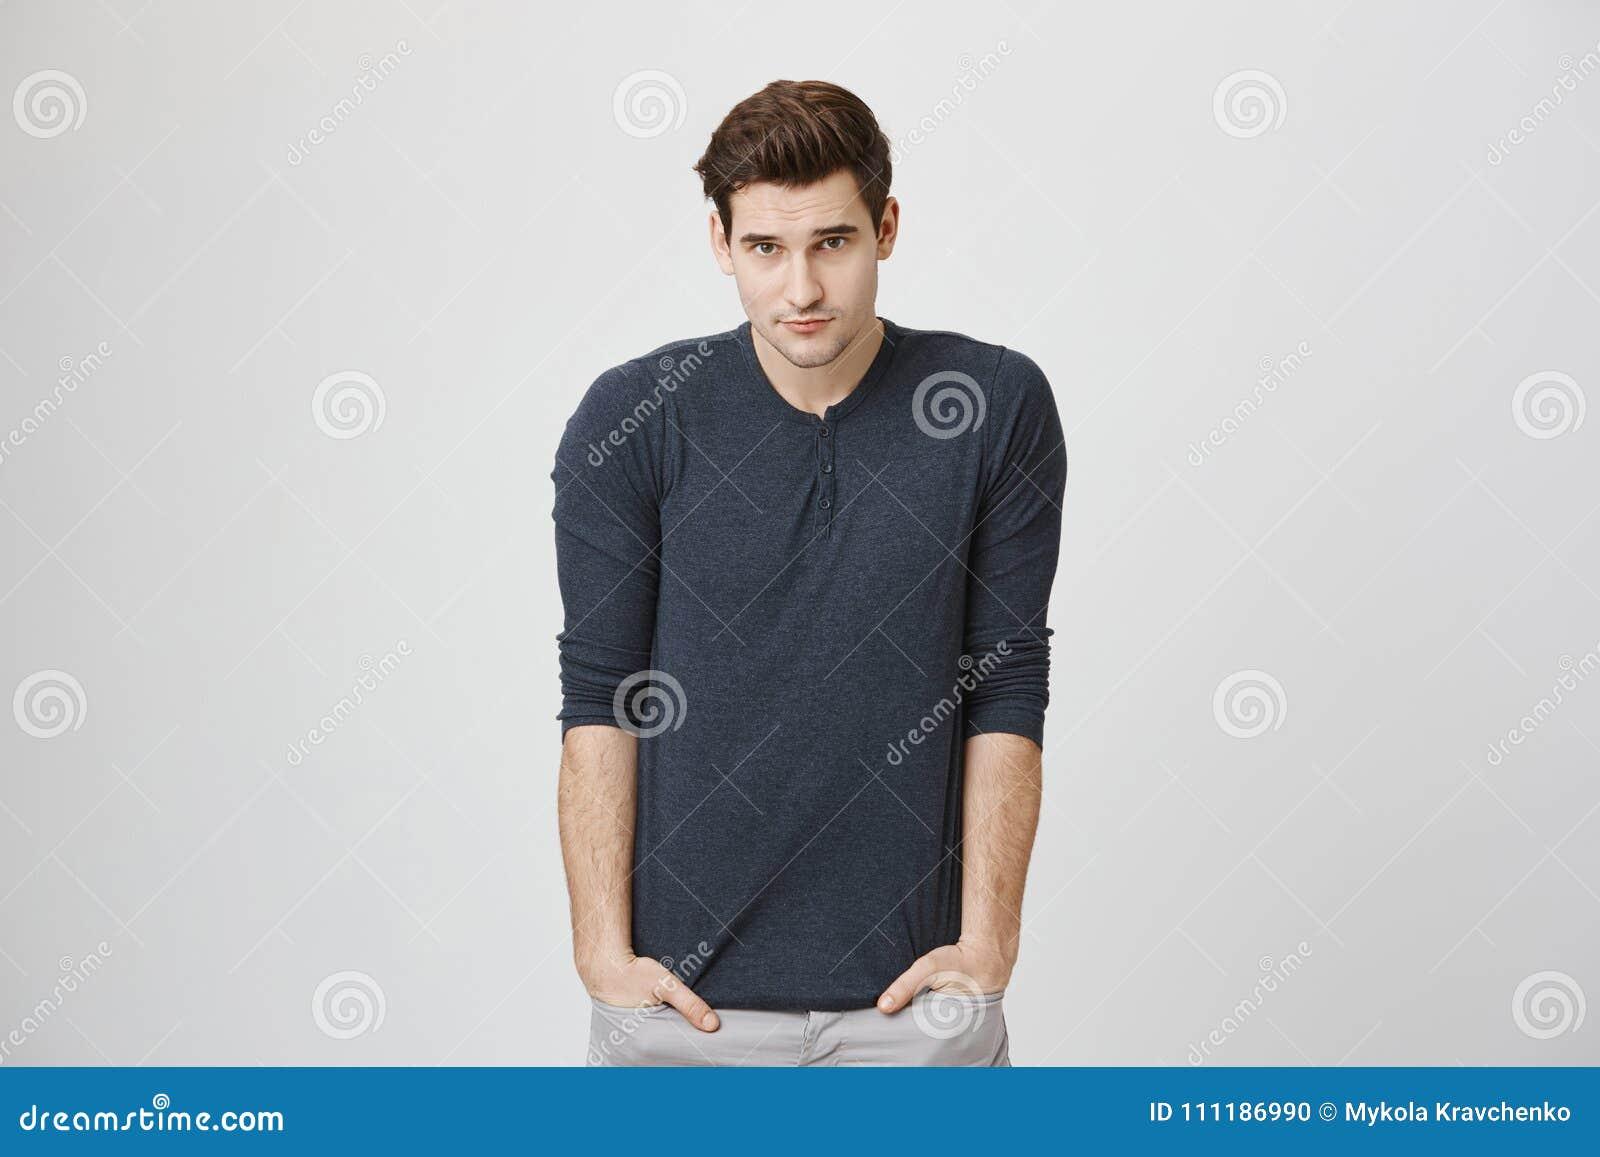 Understanding shy male body language